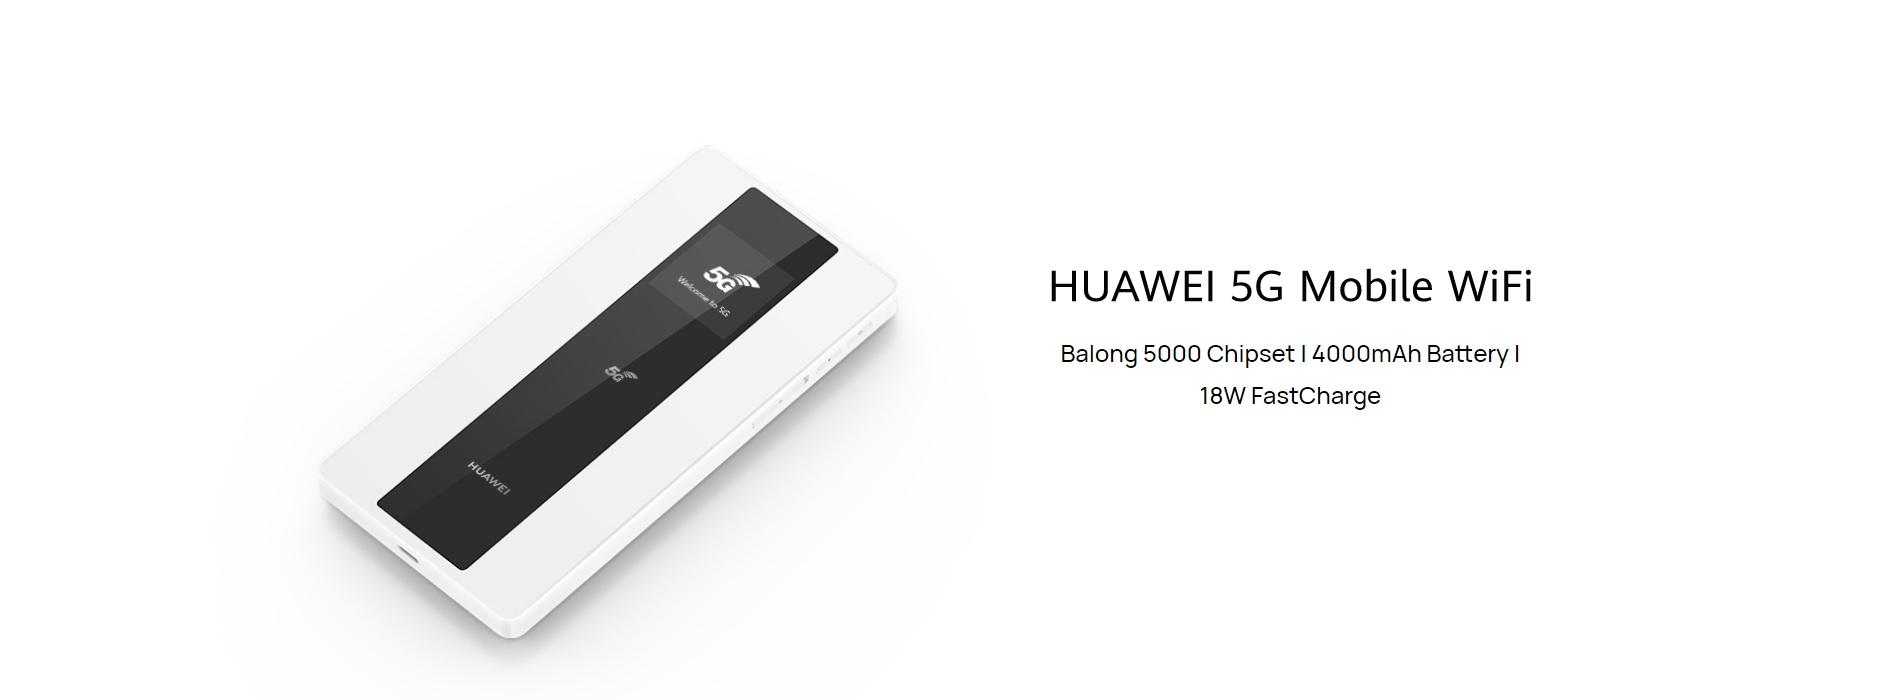 HUAWEI-5G-Mobile-WiFi-Alezay-Banner